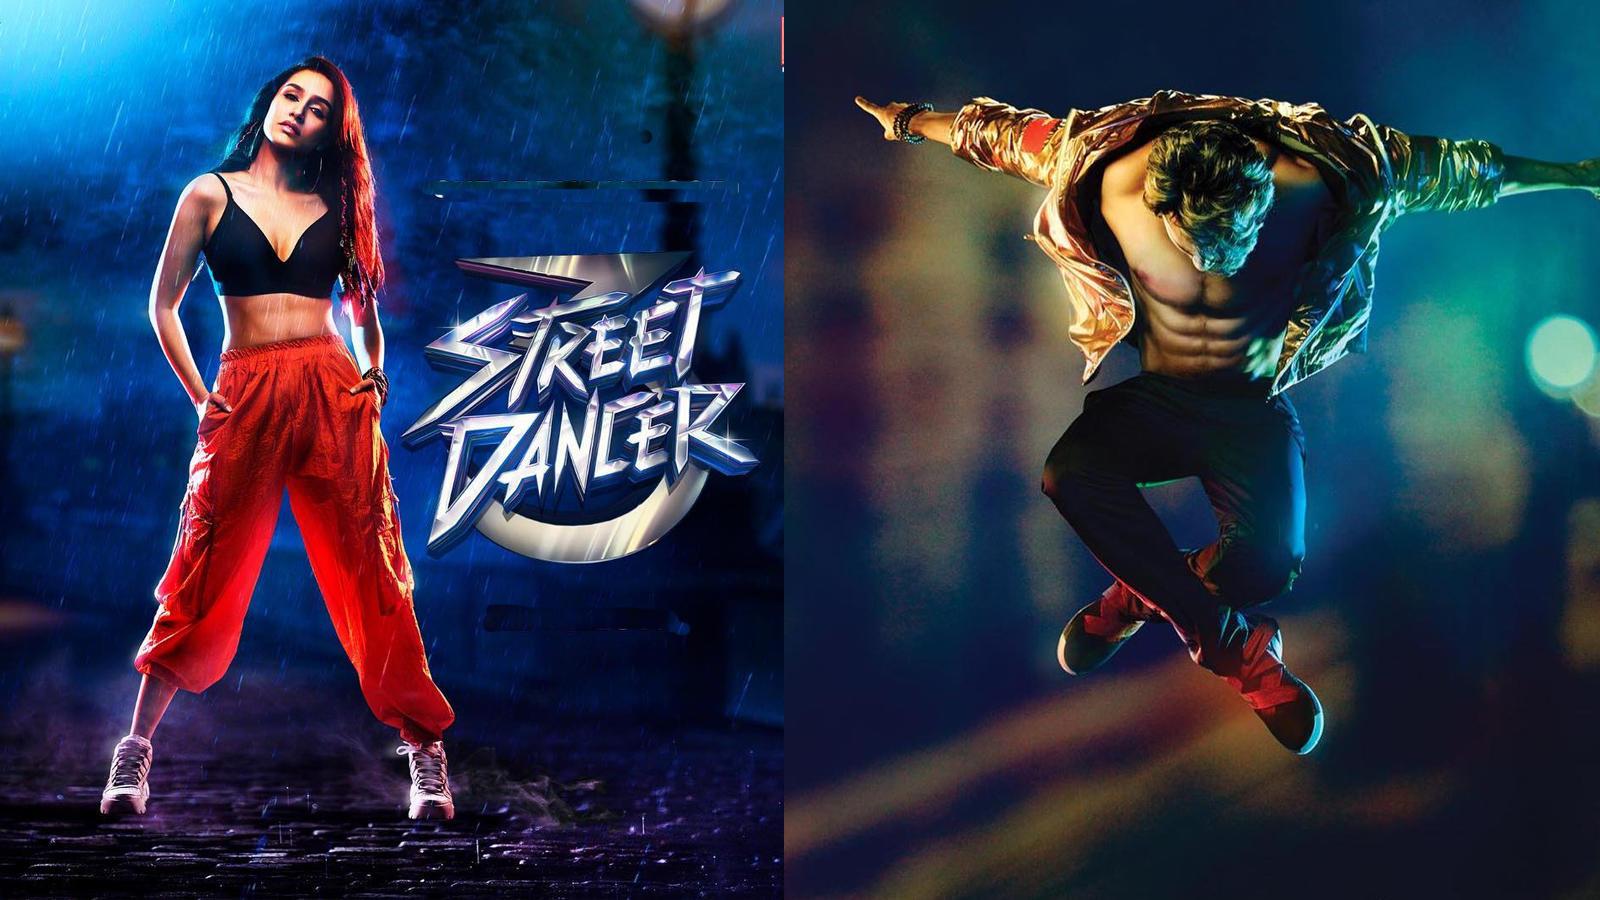 Revealed! Shraddha Kapoor and Varun Dhawan starrer 'Street Dancer 3D' has 12 songs